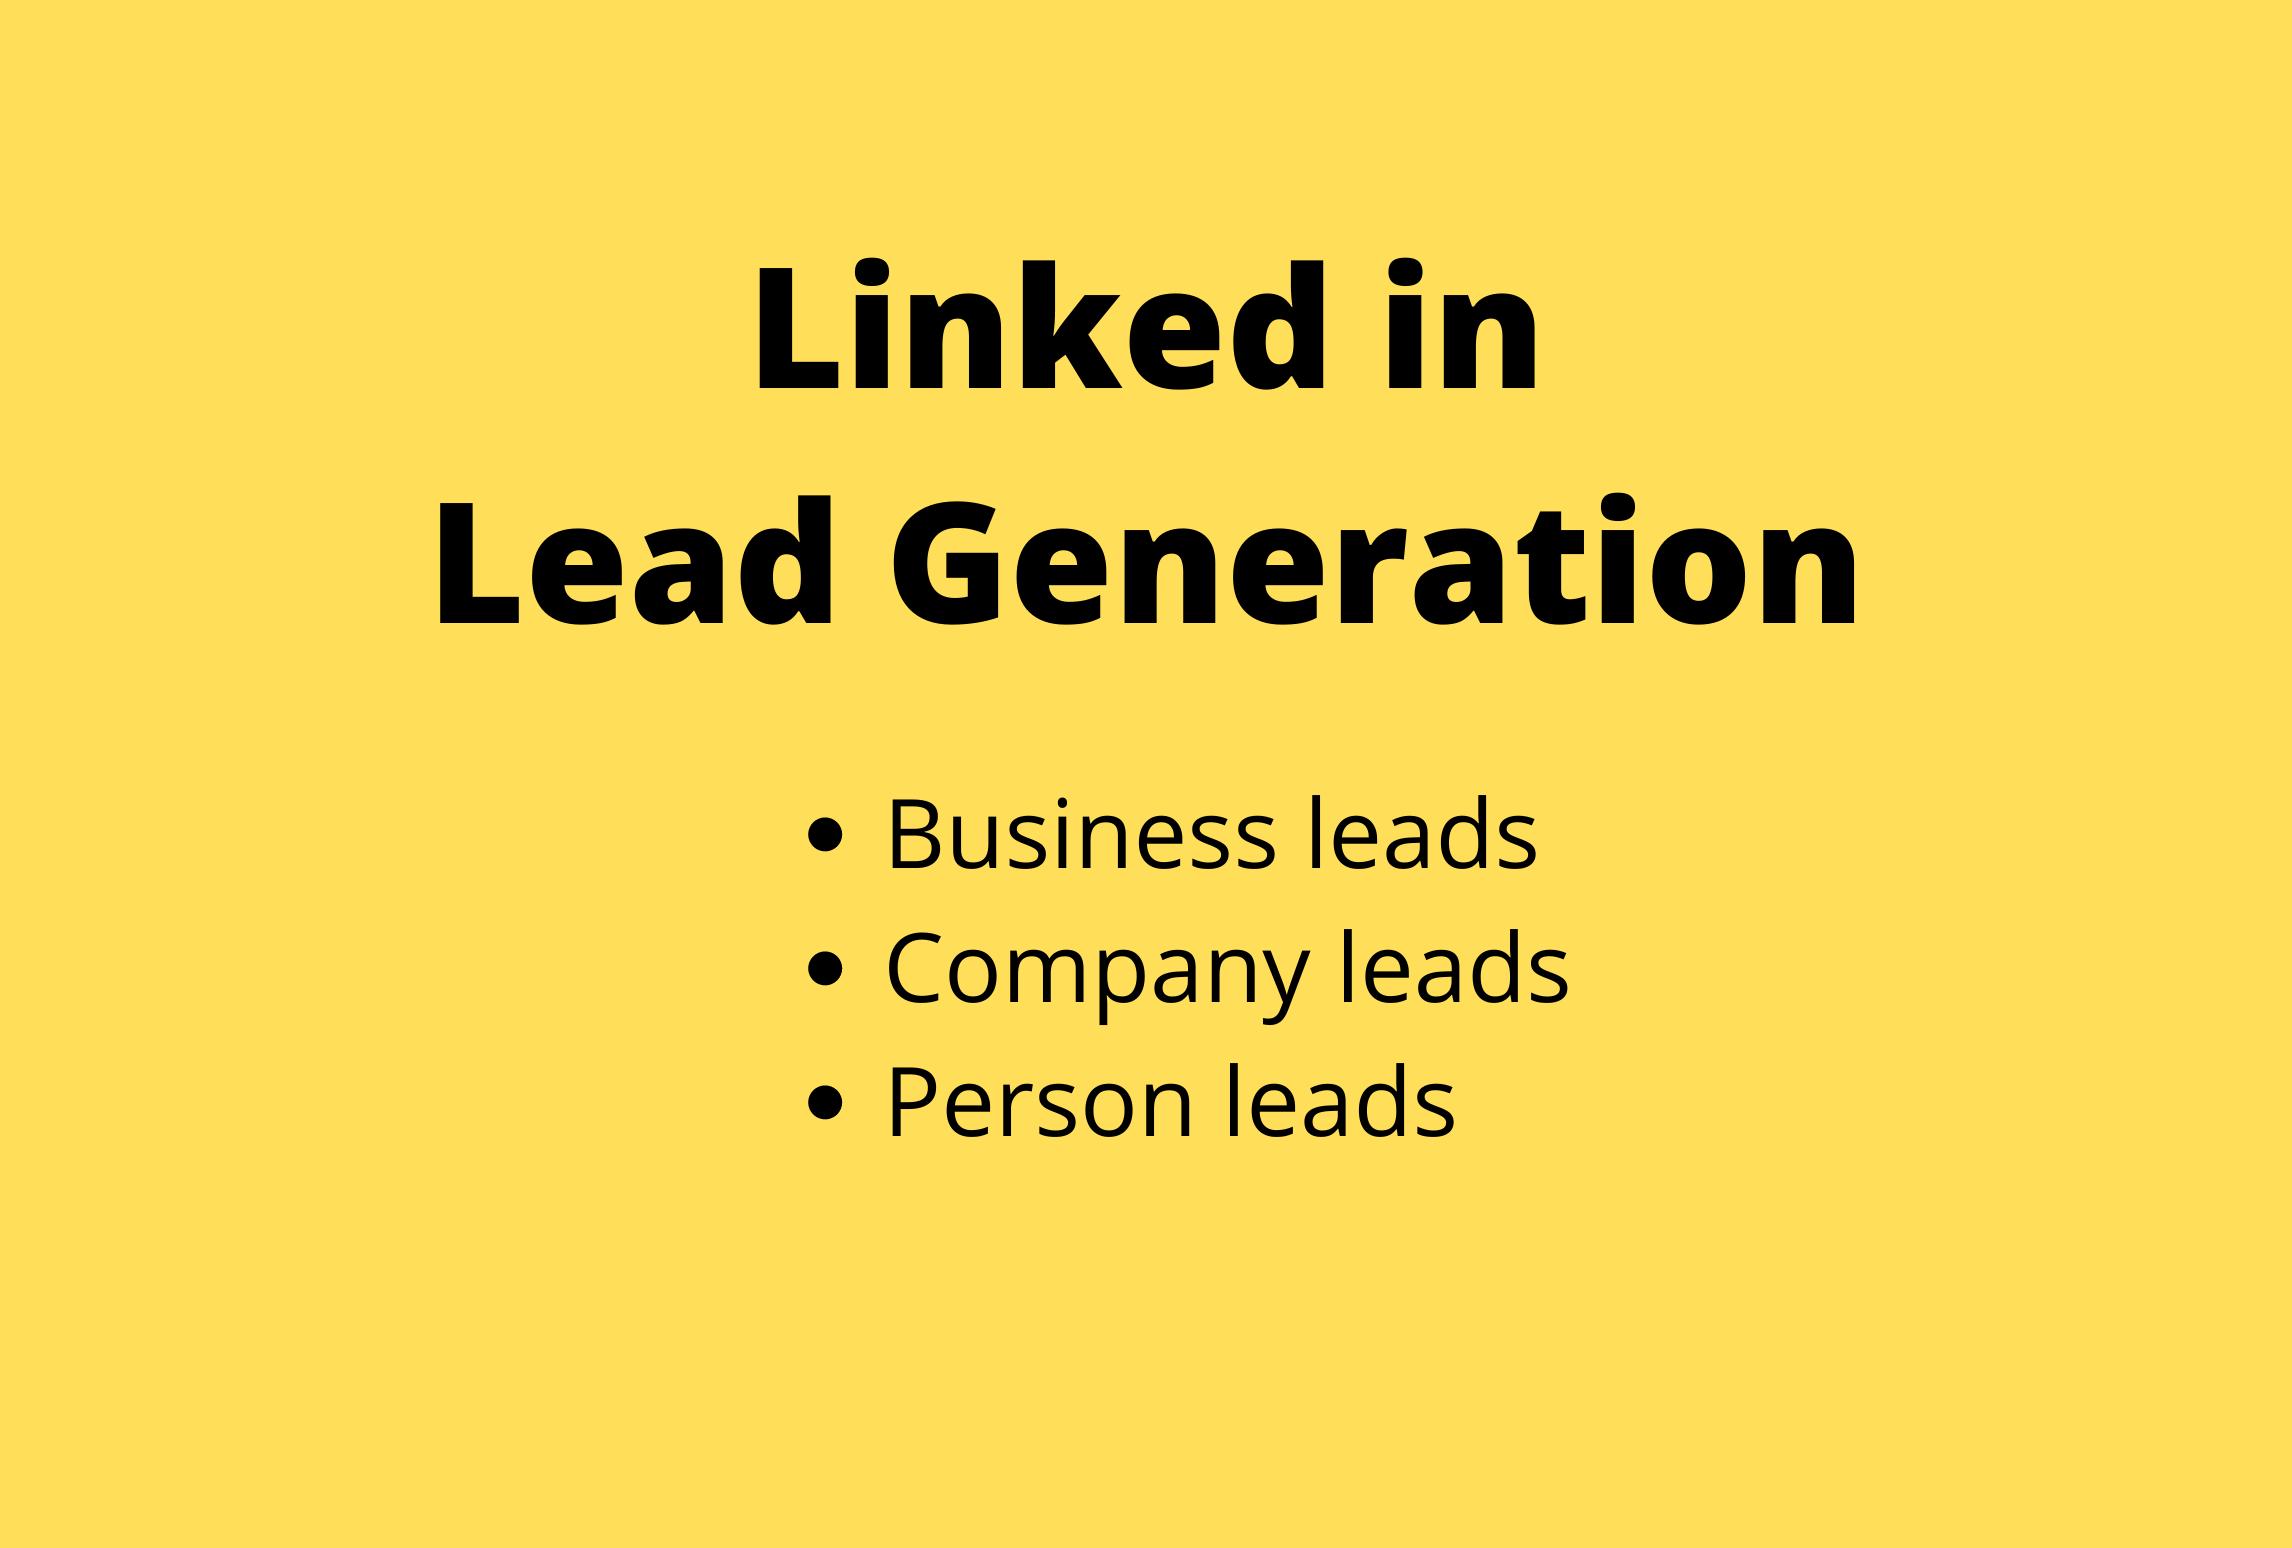 I can generate b2b LinkedIn lead generation